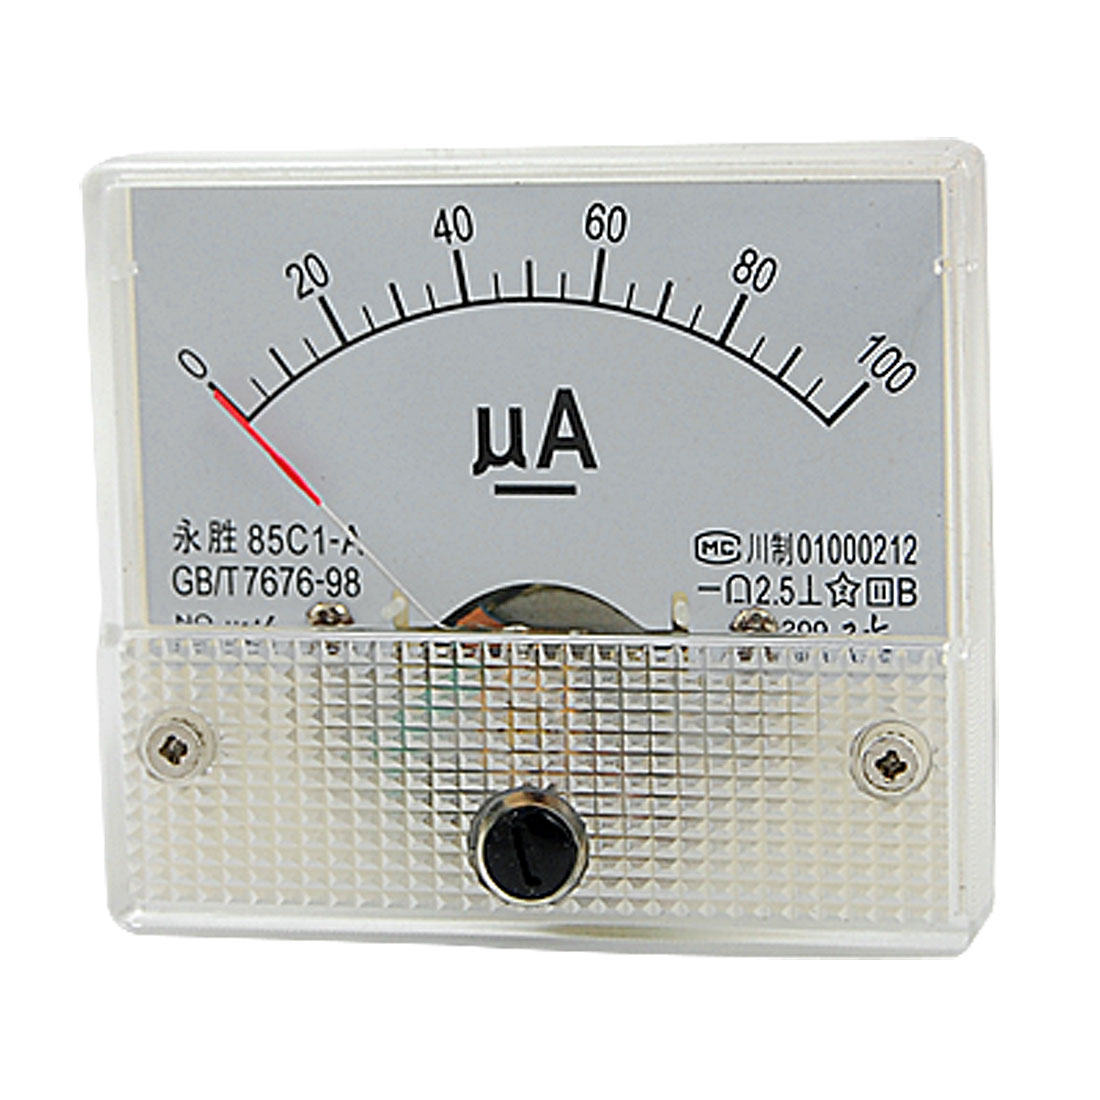 85C1-A DC 0-100uA Analog Panel Meter Ammeter Gauge